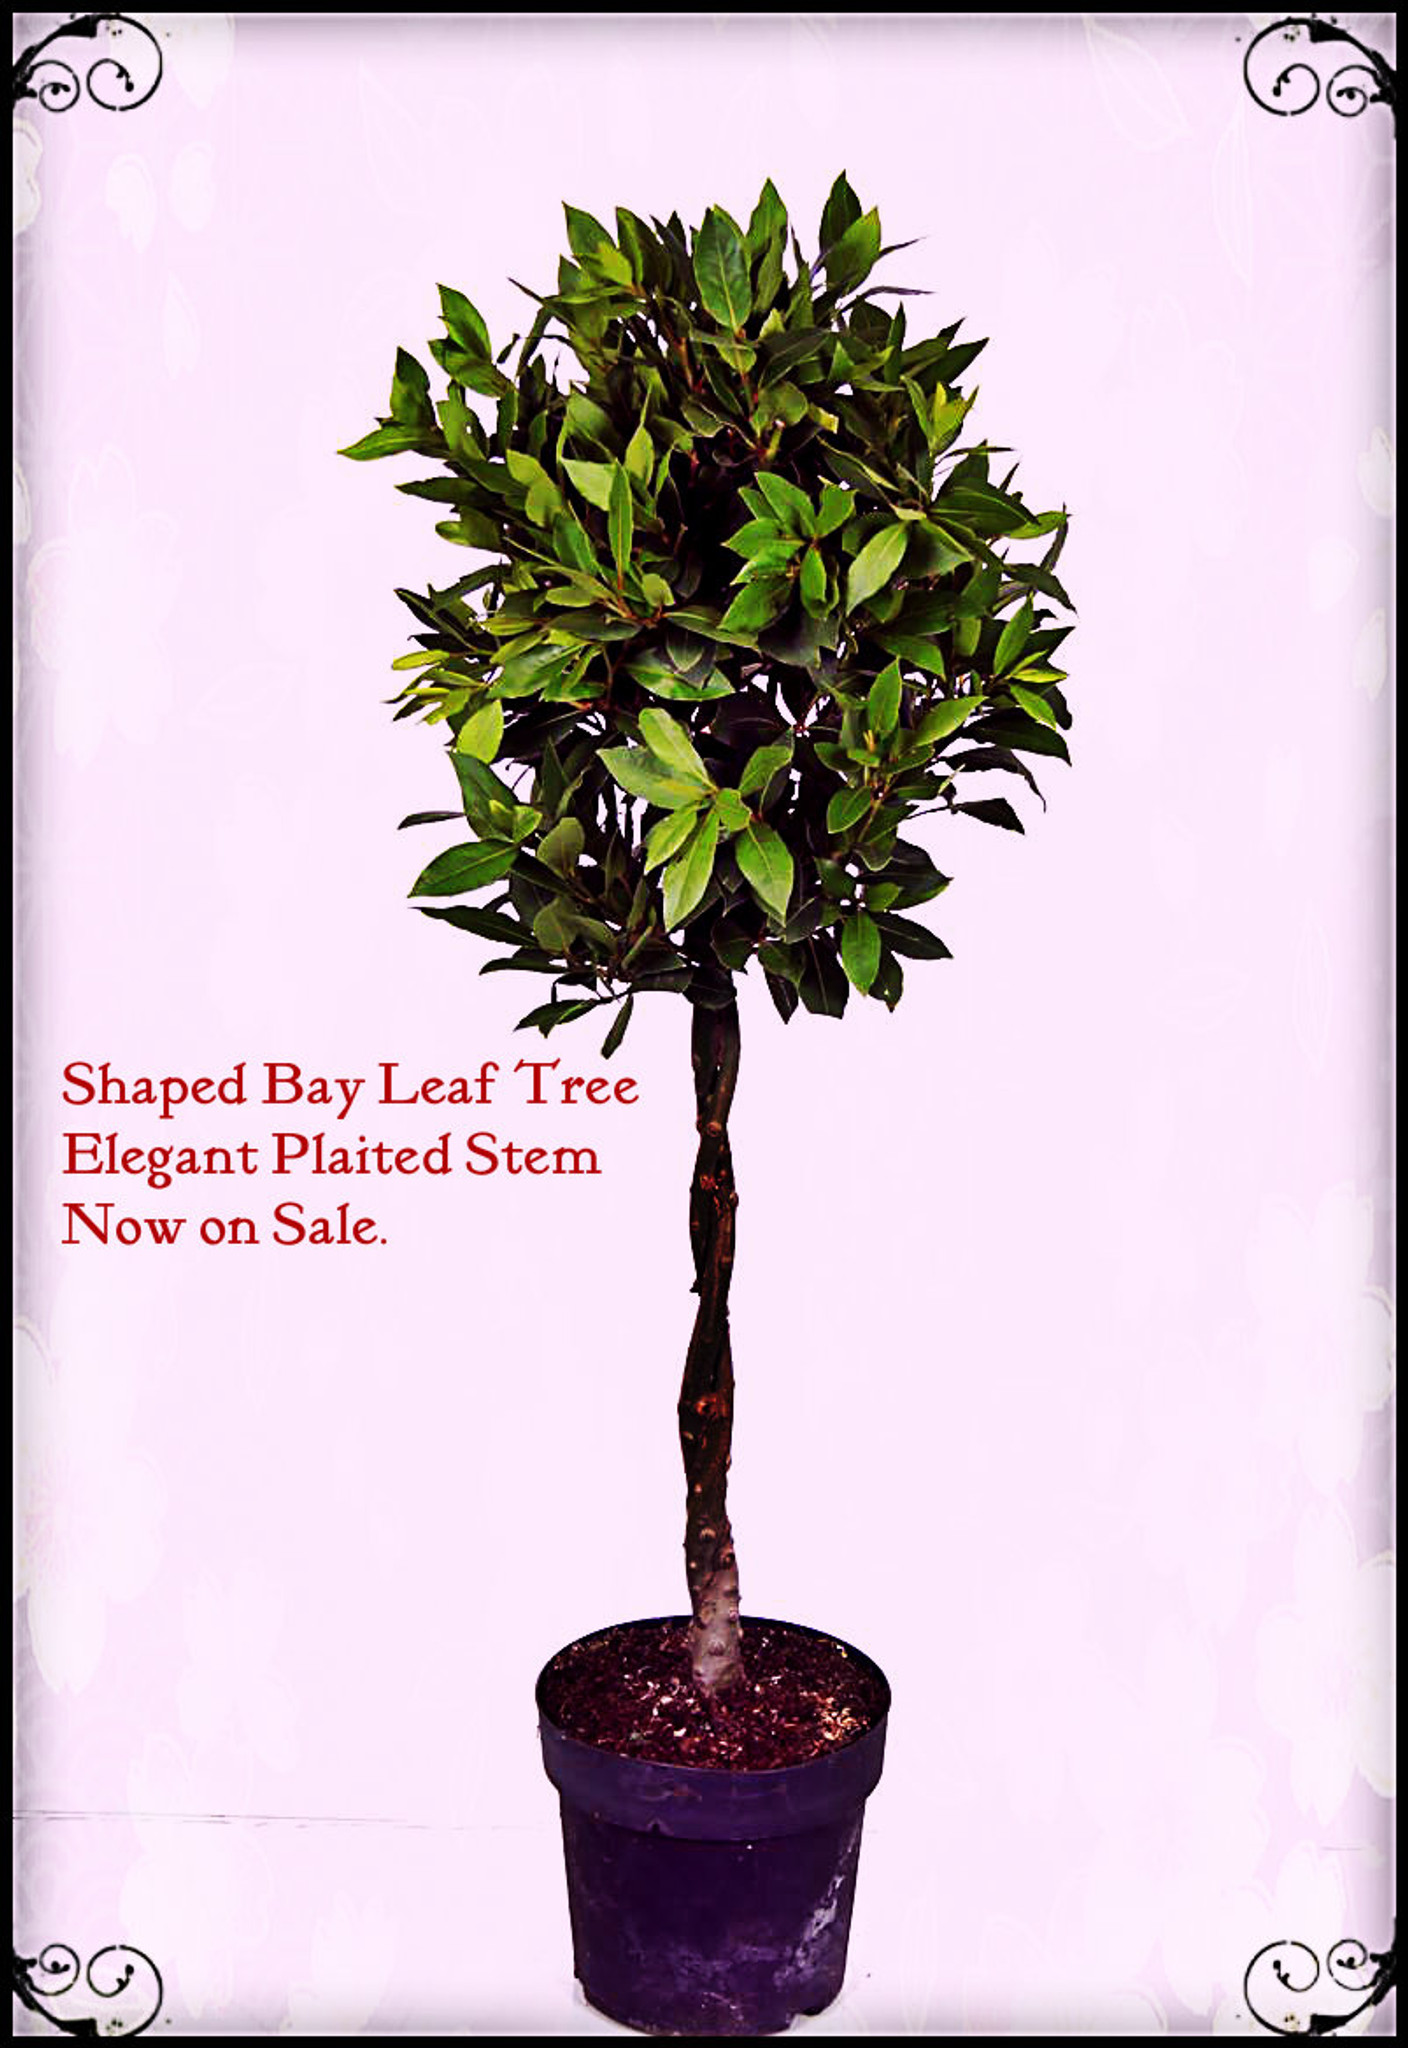 Laurus nobilis Standard Bay Tree - 1 tree Shaped with Plaited Stem - Height 100cm  ( 3ft+)